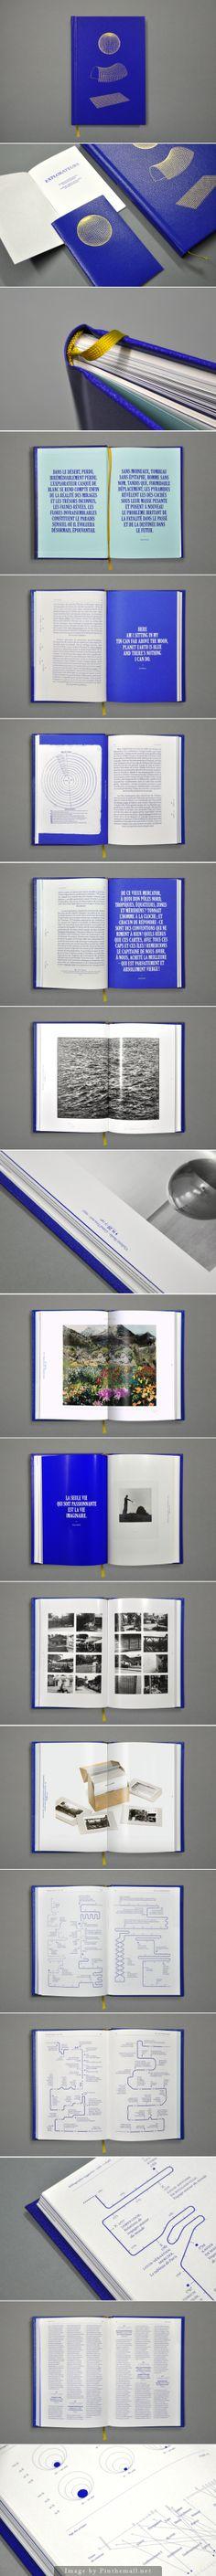 Explorateurs | atelier muesli